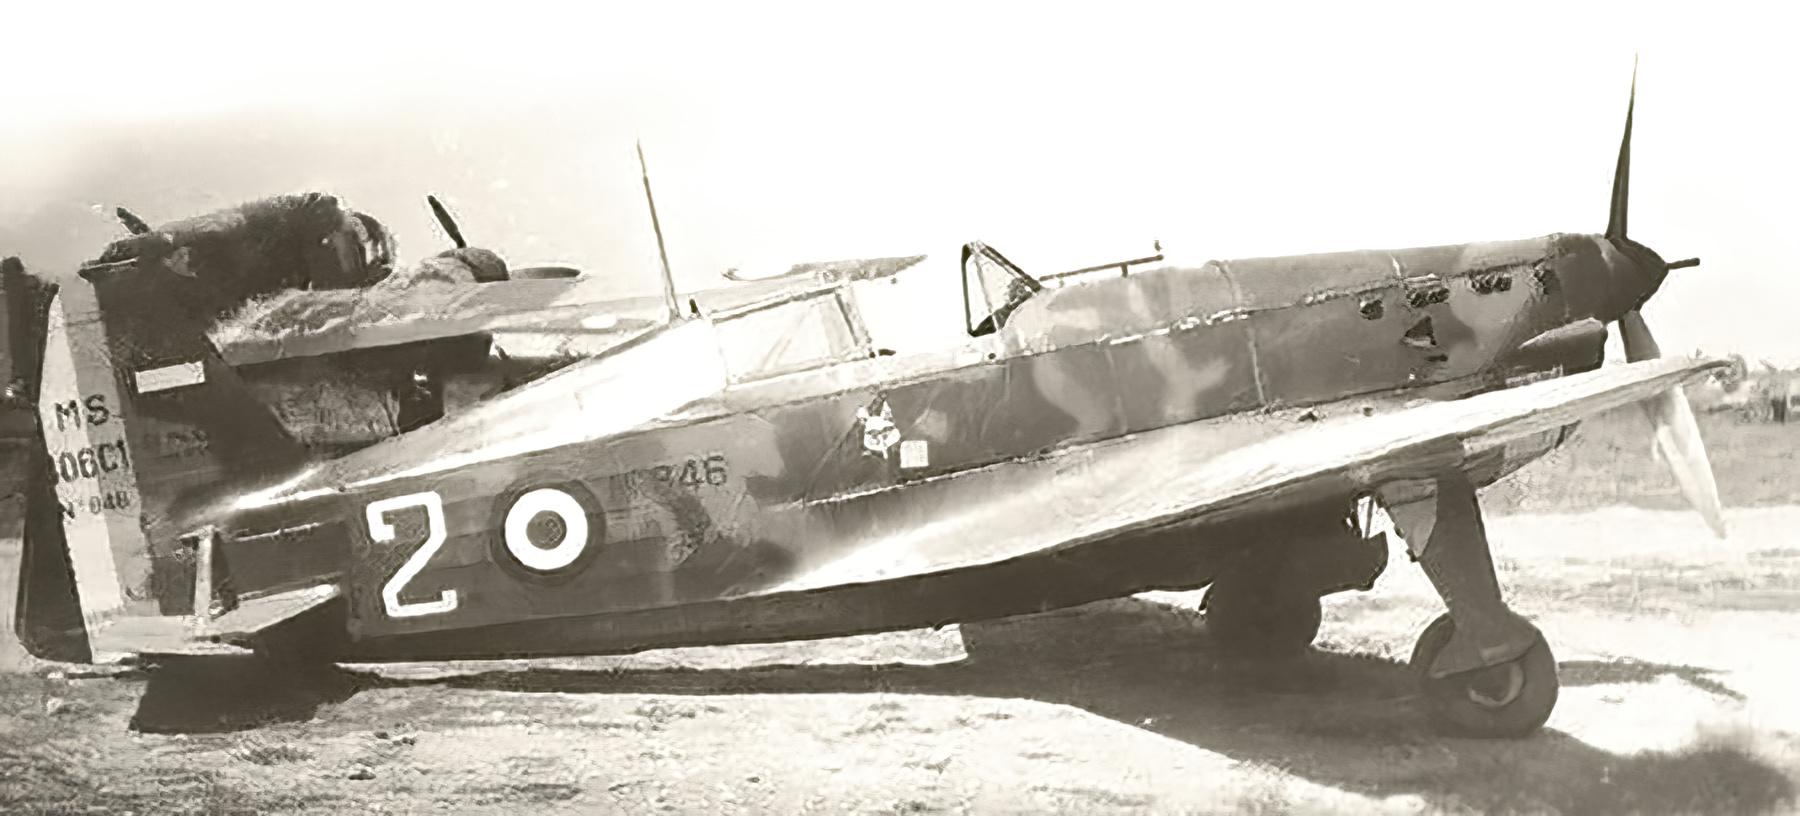 French Airforce Morane Saulnier MS 406C1 sn846 GC III.1 White 2 France 1940 web 01